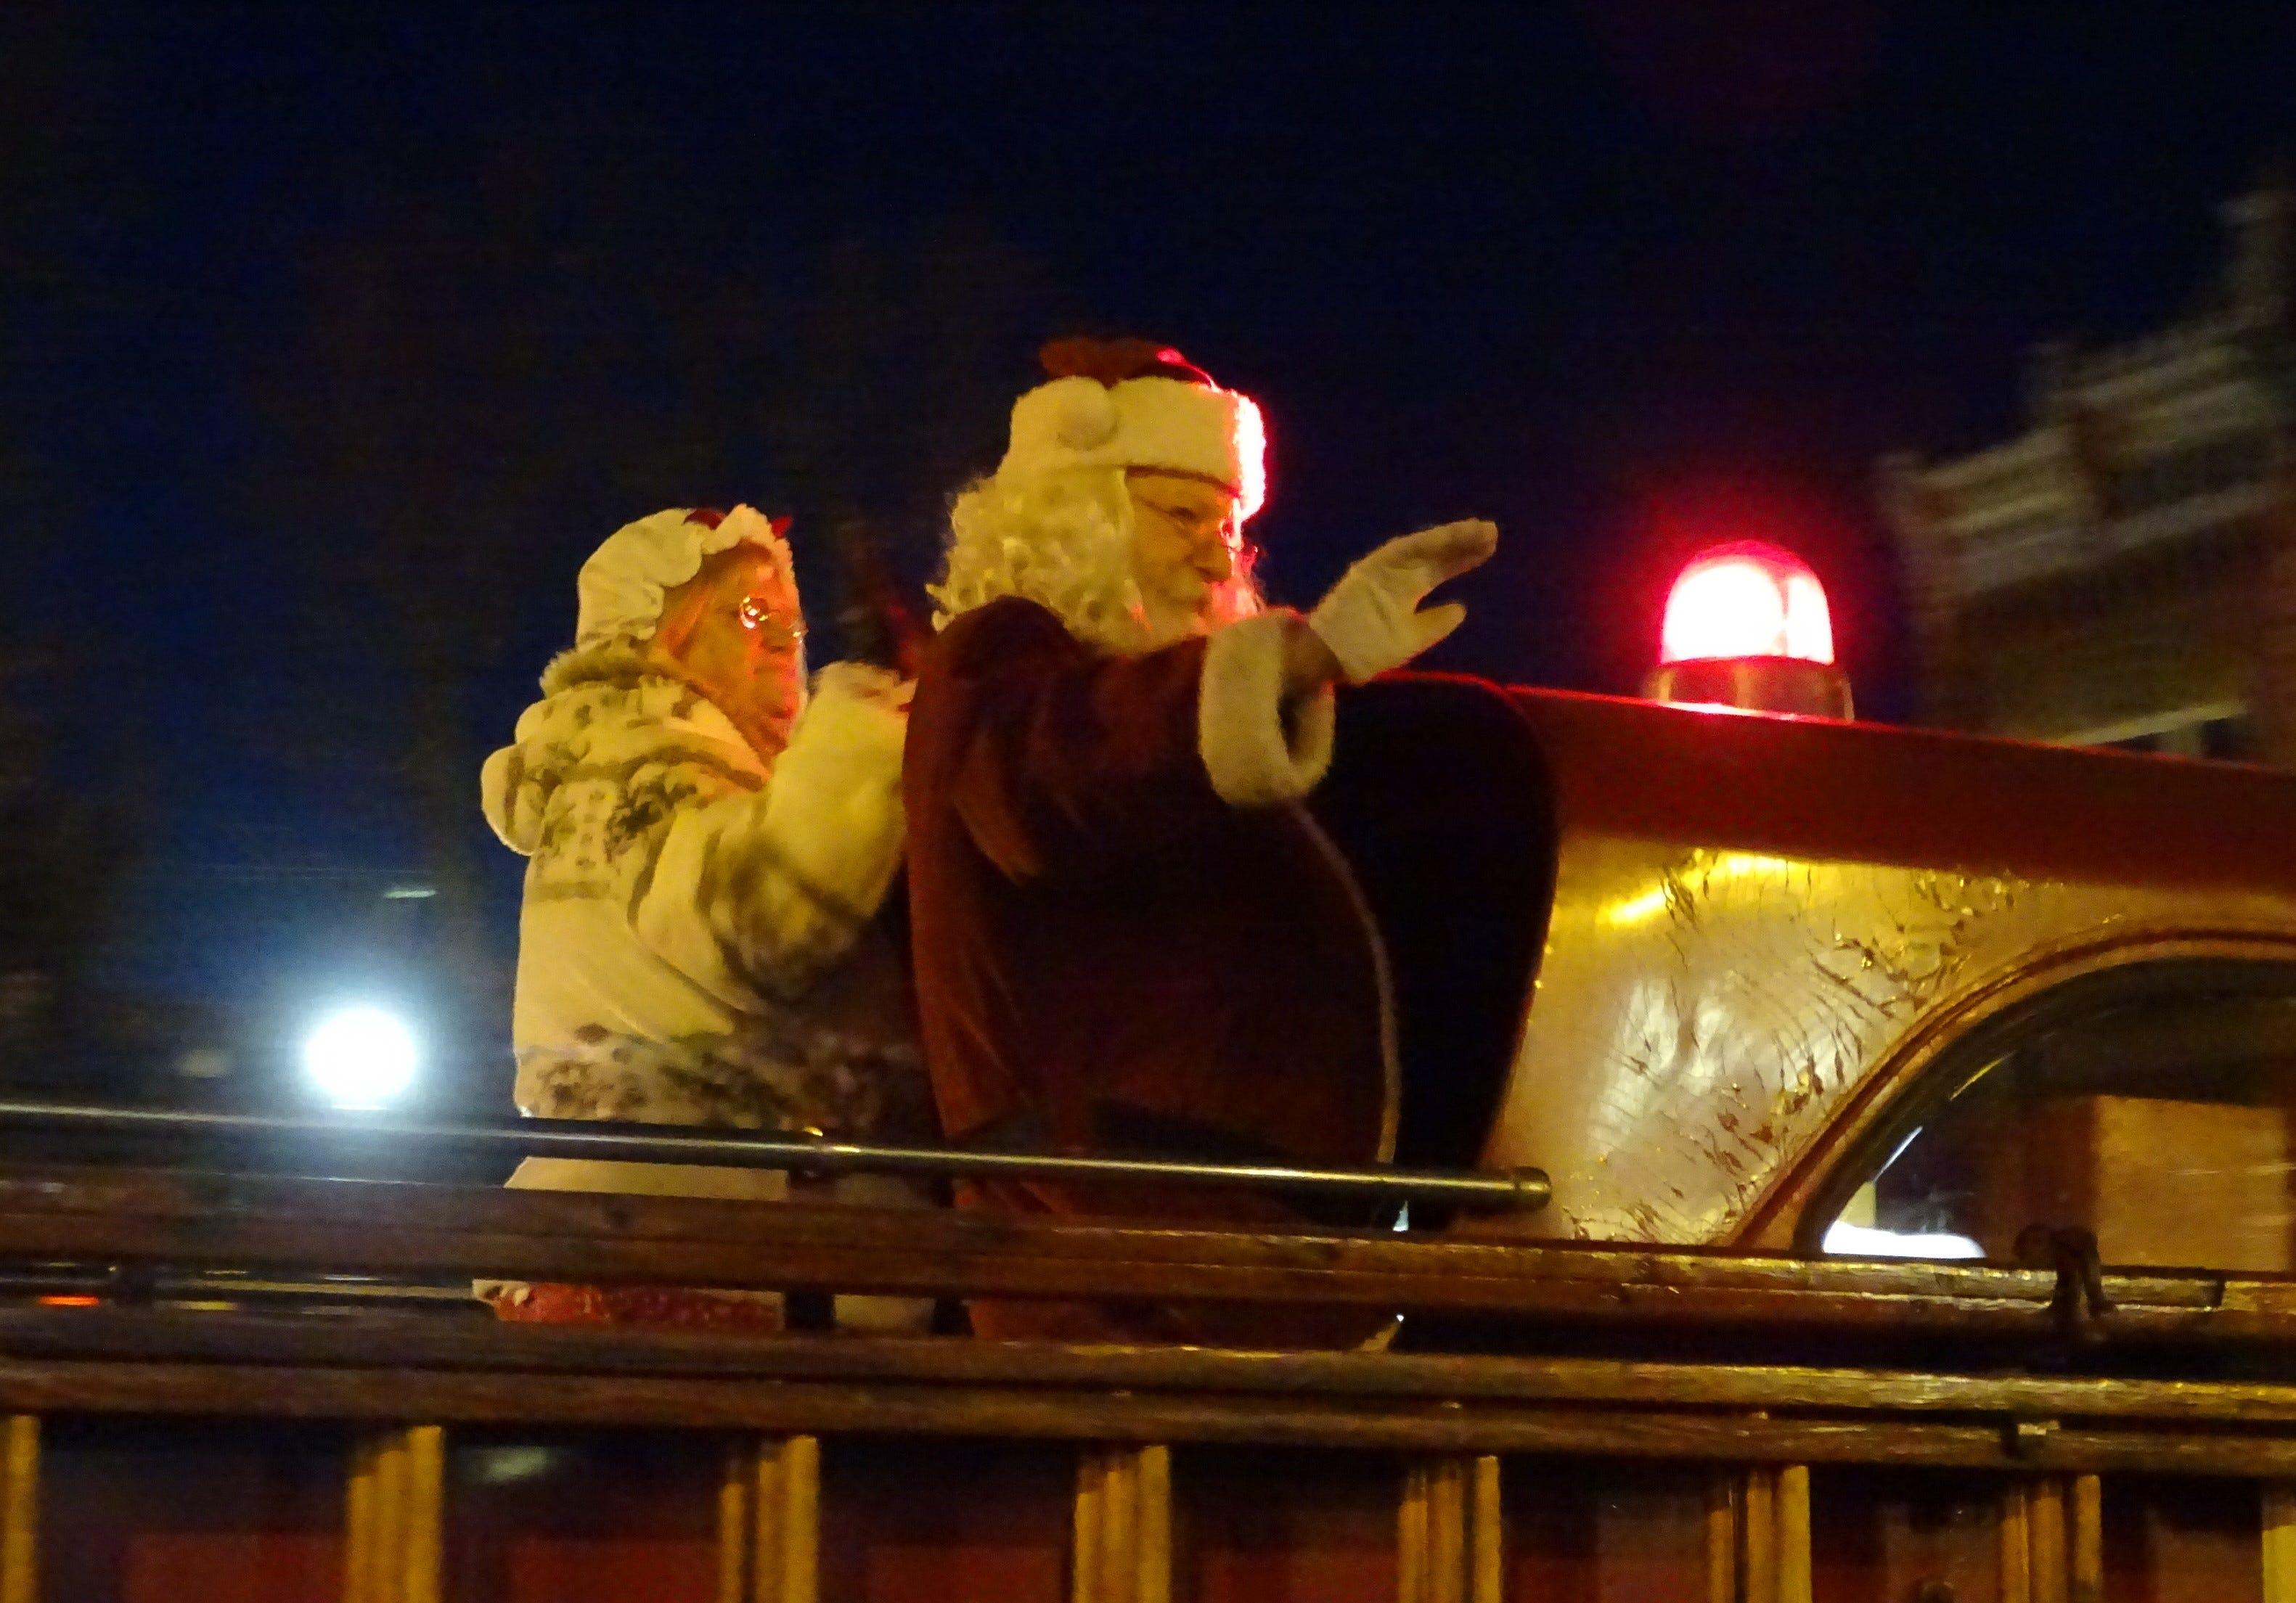 Willard Christmas Parade 2021 Special Santa Parades Will Give Children That Christmas Magic